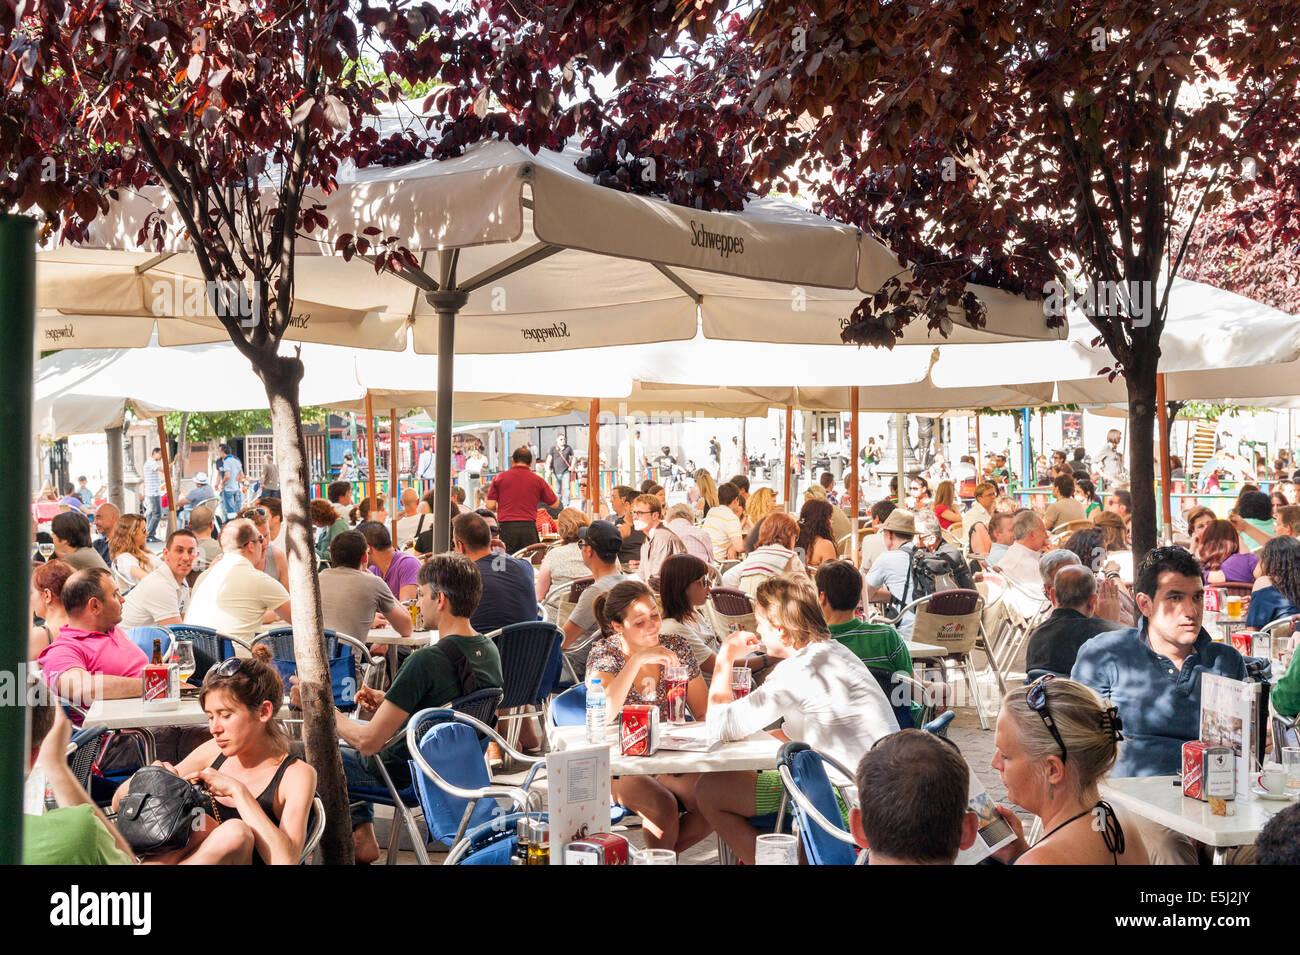 People at crowded bar tables on Plaza de Santa Ana, Barrio de las Letras, Madrid, Spain - Stock Image